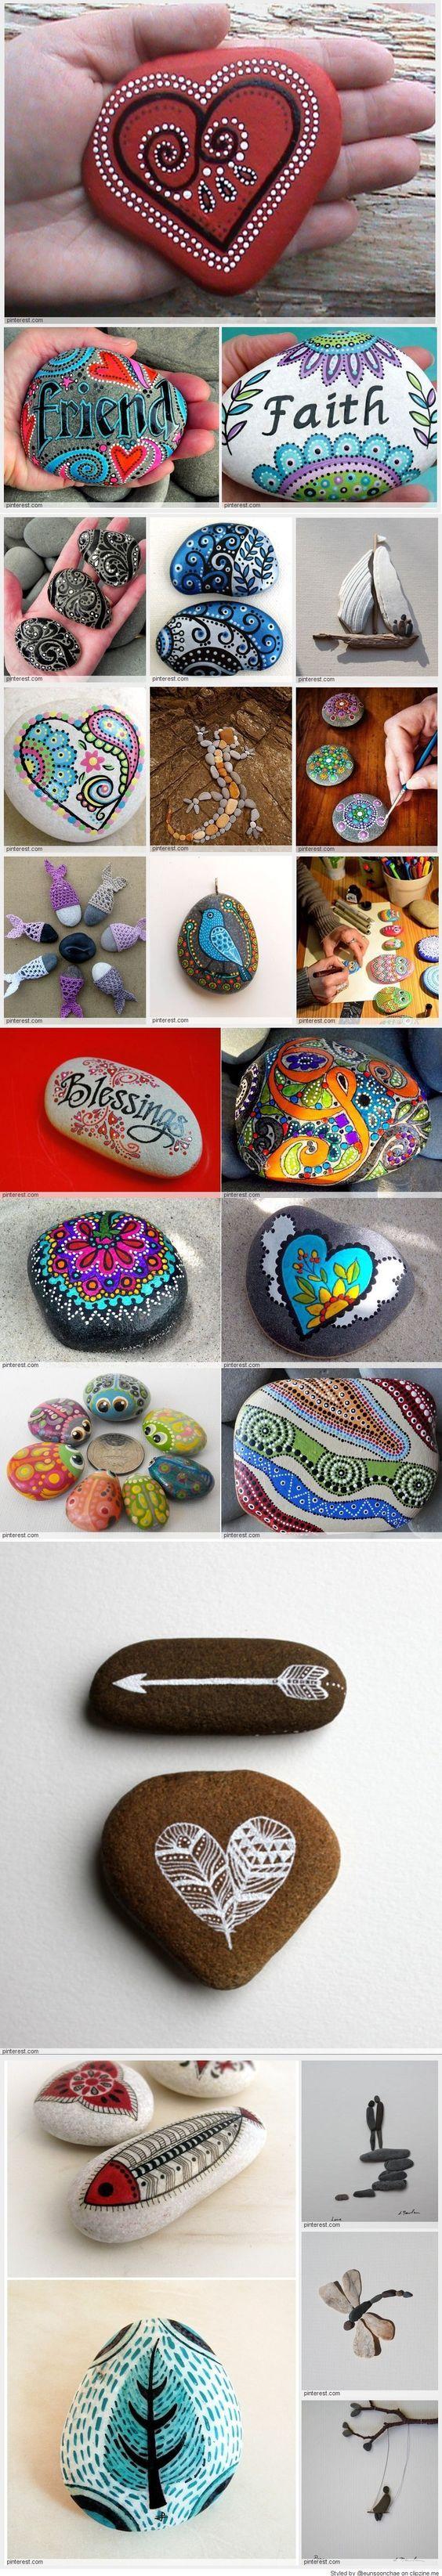 Great Idea for Stone Art: